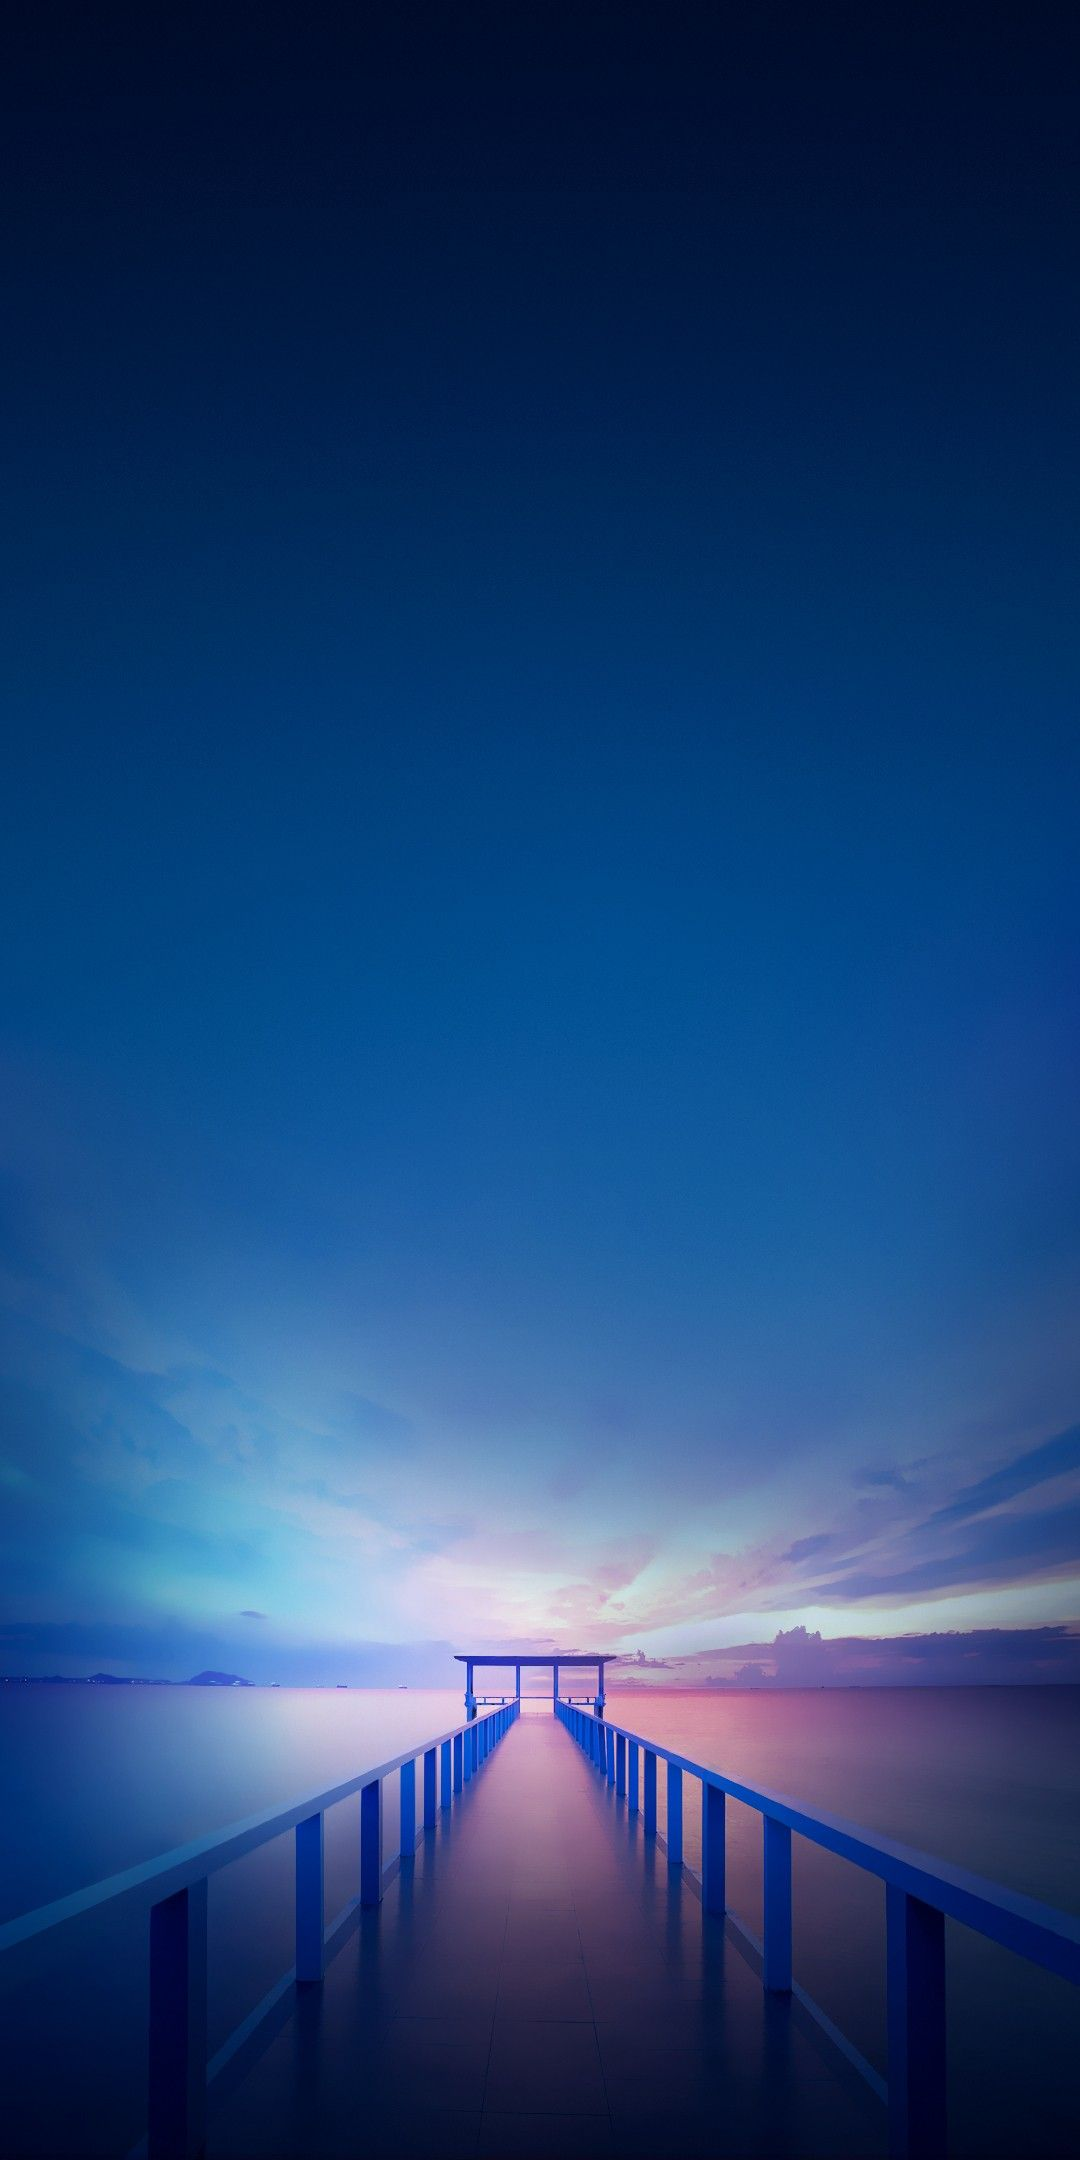 Vivo X20 Stock Wallpaper 01 Blue Calm Loveandlight Mindfulness Repinned By Eyespiration Landscape Wallpaper Huawei Wallpapers Scenery Wallpaper